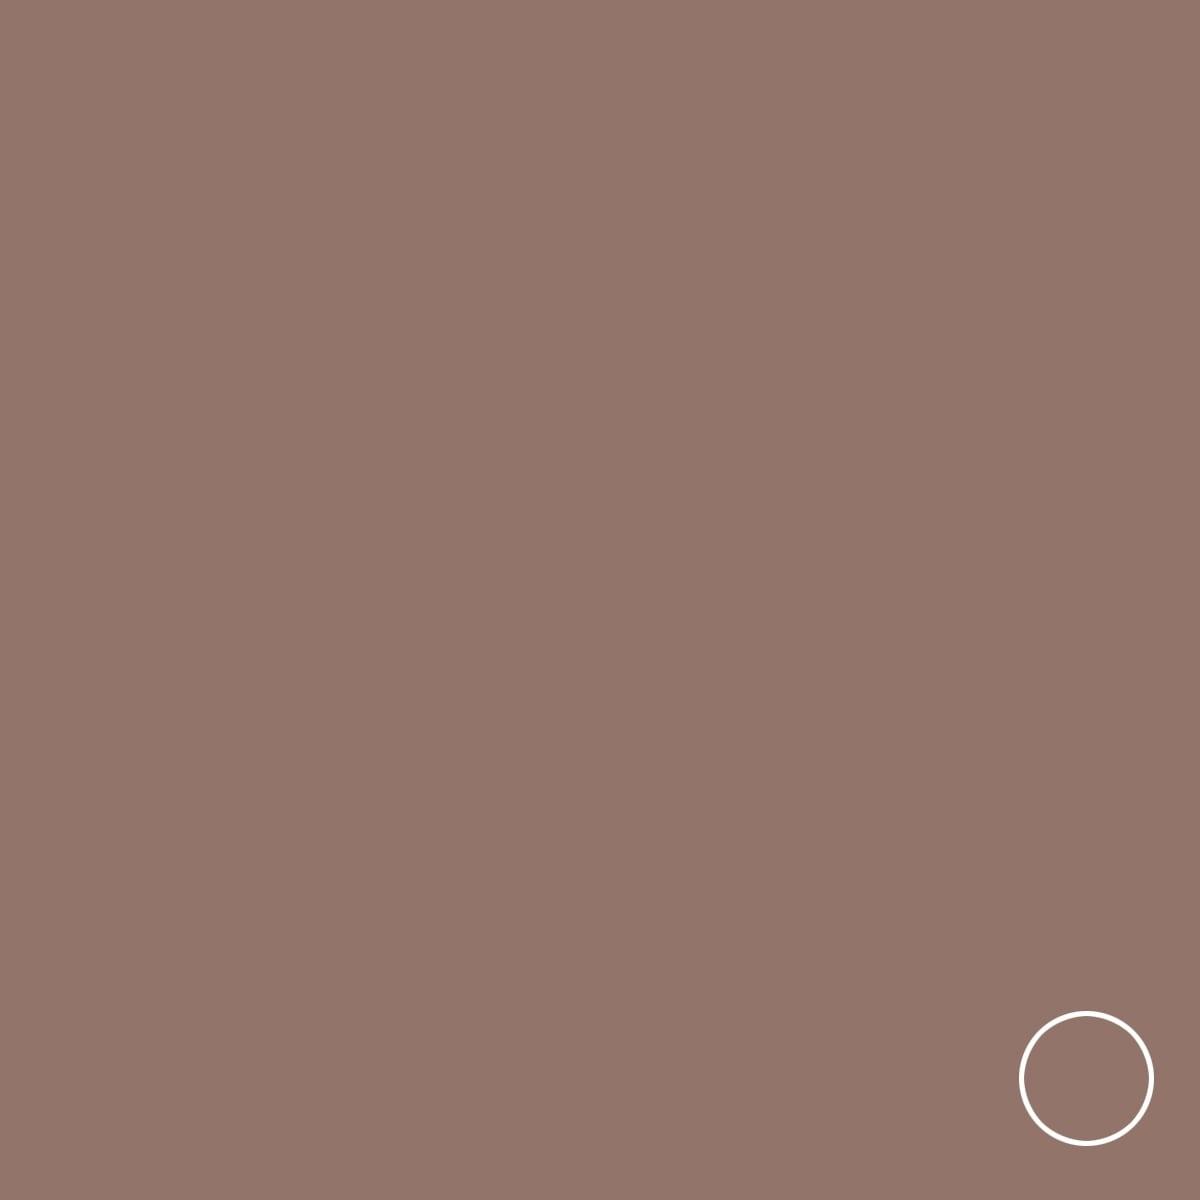 ORGANIC LINE (5ml)  - PIGMENT AREOLES 50 ORGANICLINE AMIEA (5 ml)